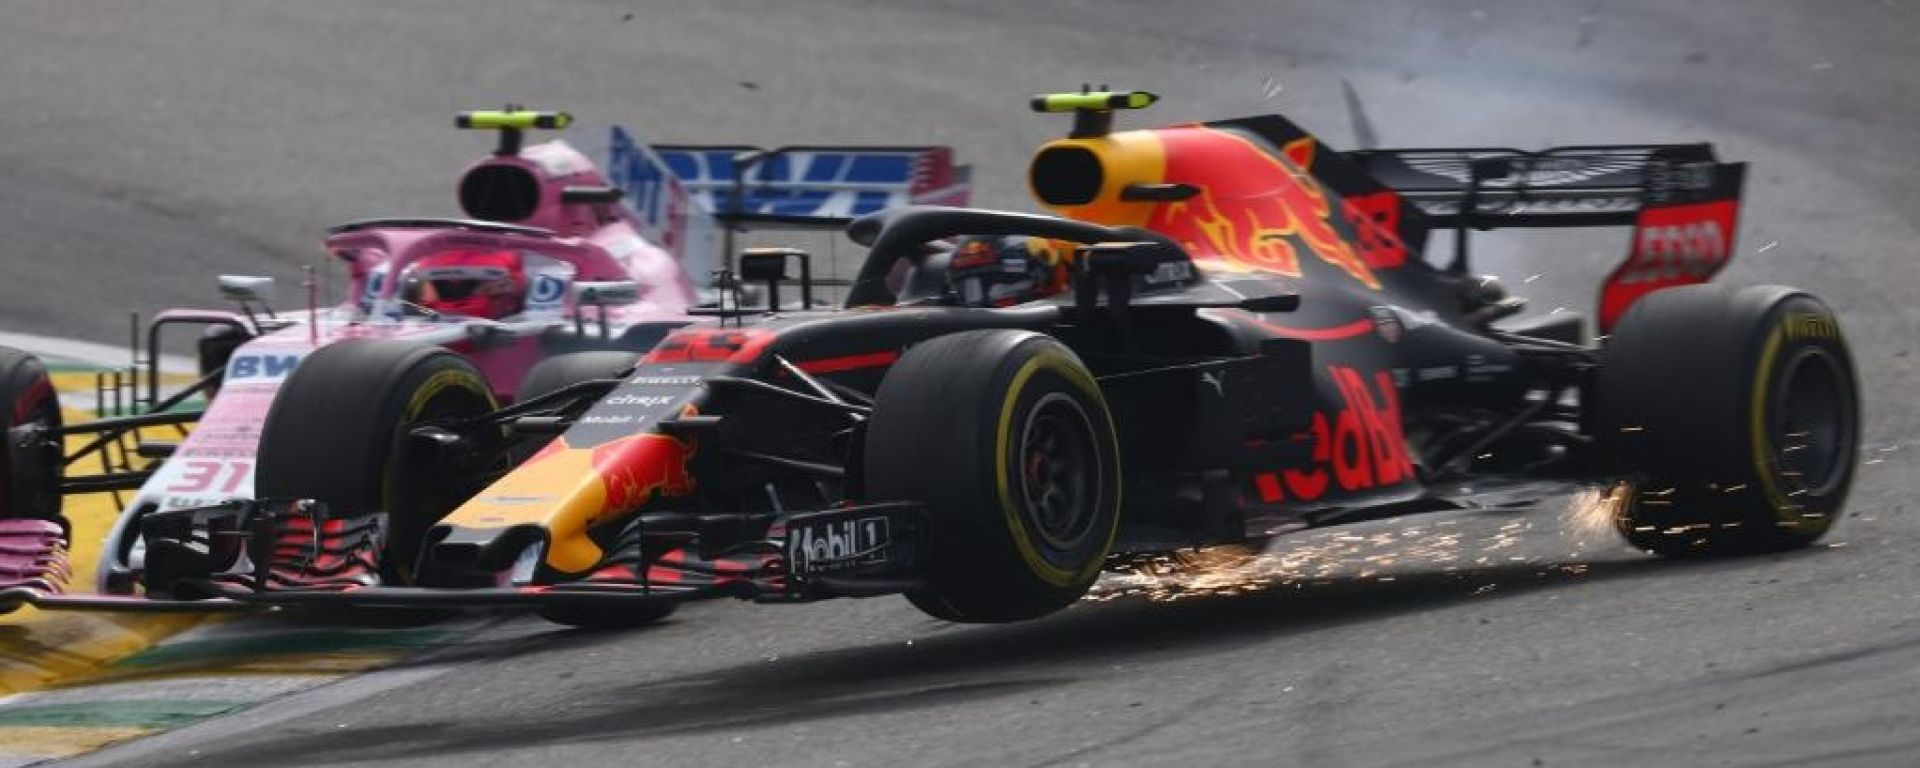 "GP Brasile, Verstappen: ""Colpa di un idiota"". E con Ocon finisce a spintoni"